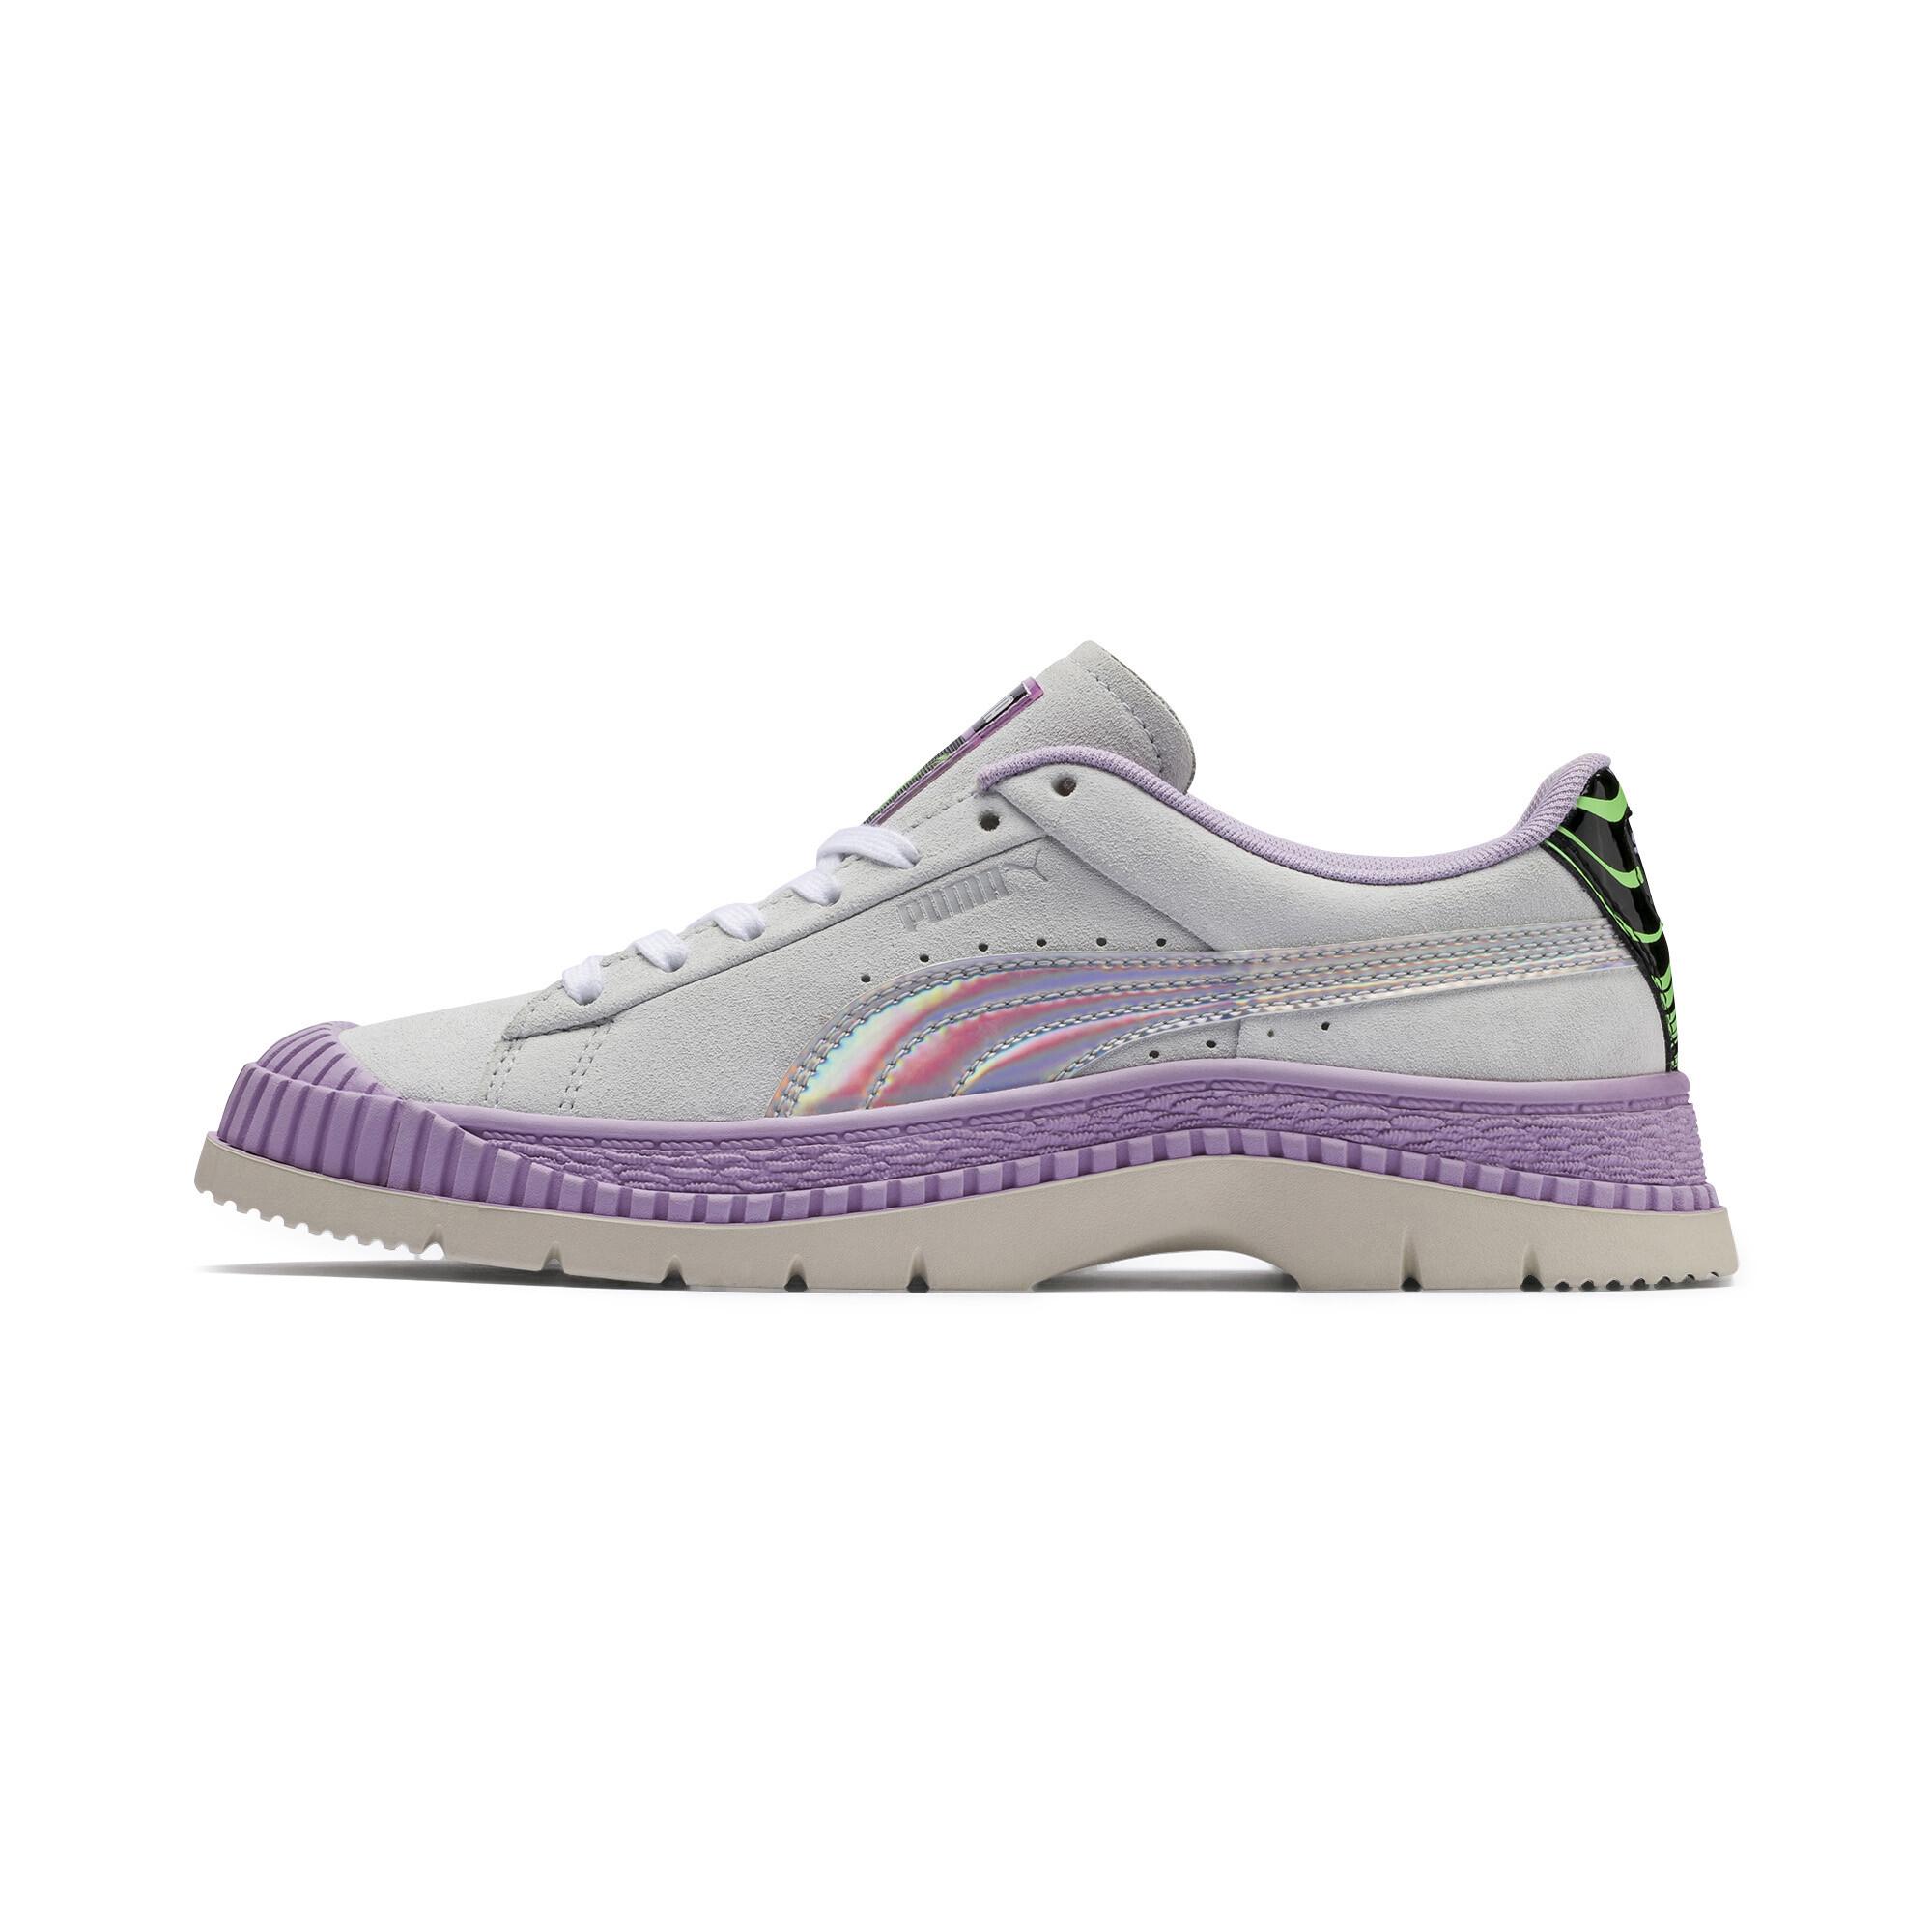 PUMA-Women-039-s-Utility-Dimension-Sneakers thumbnail 4